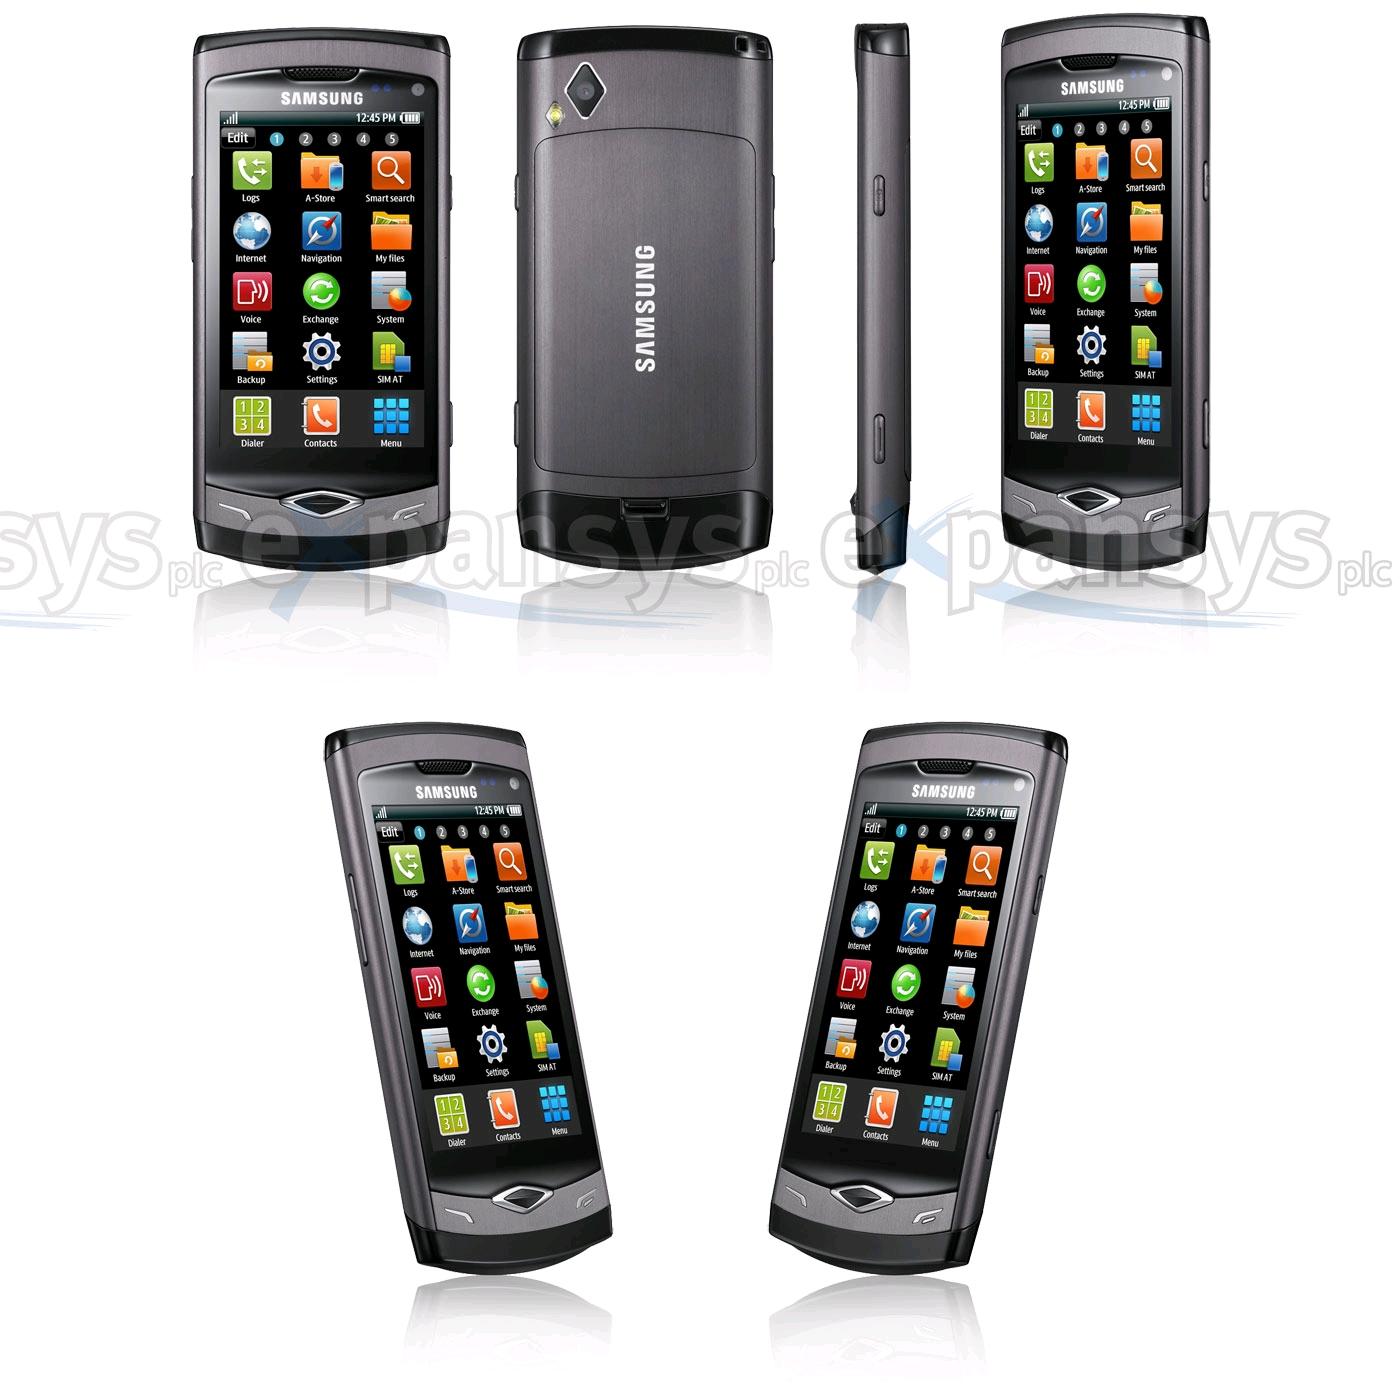 Samsung Star Mobile Phone Wallpaper Creator 1400x1400